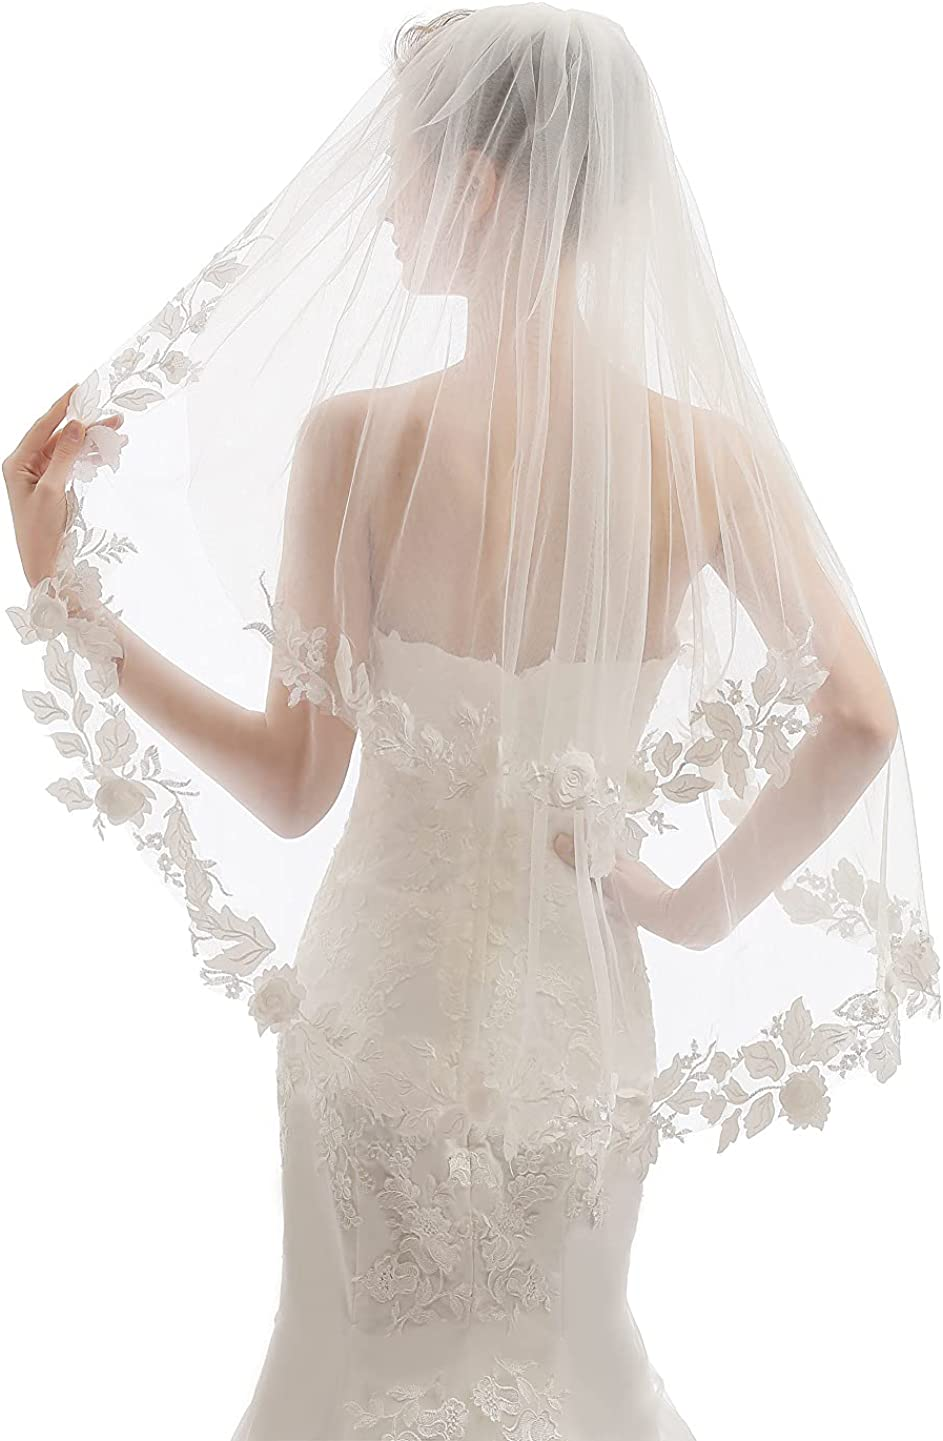 EllieHouse 2 Tier Fingertip Length Short Wedding Bridal Veil With Comb X05